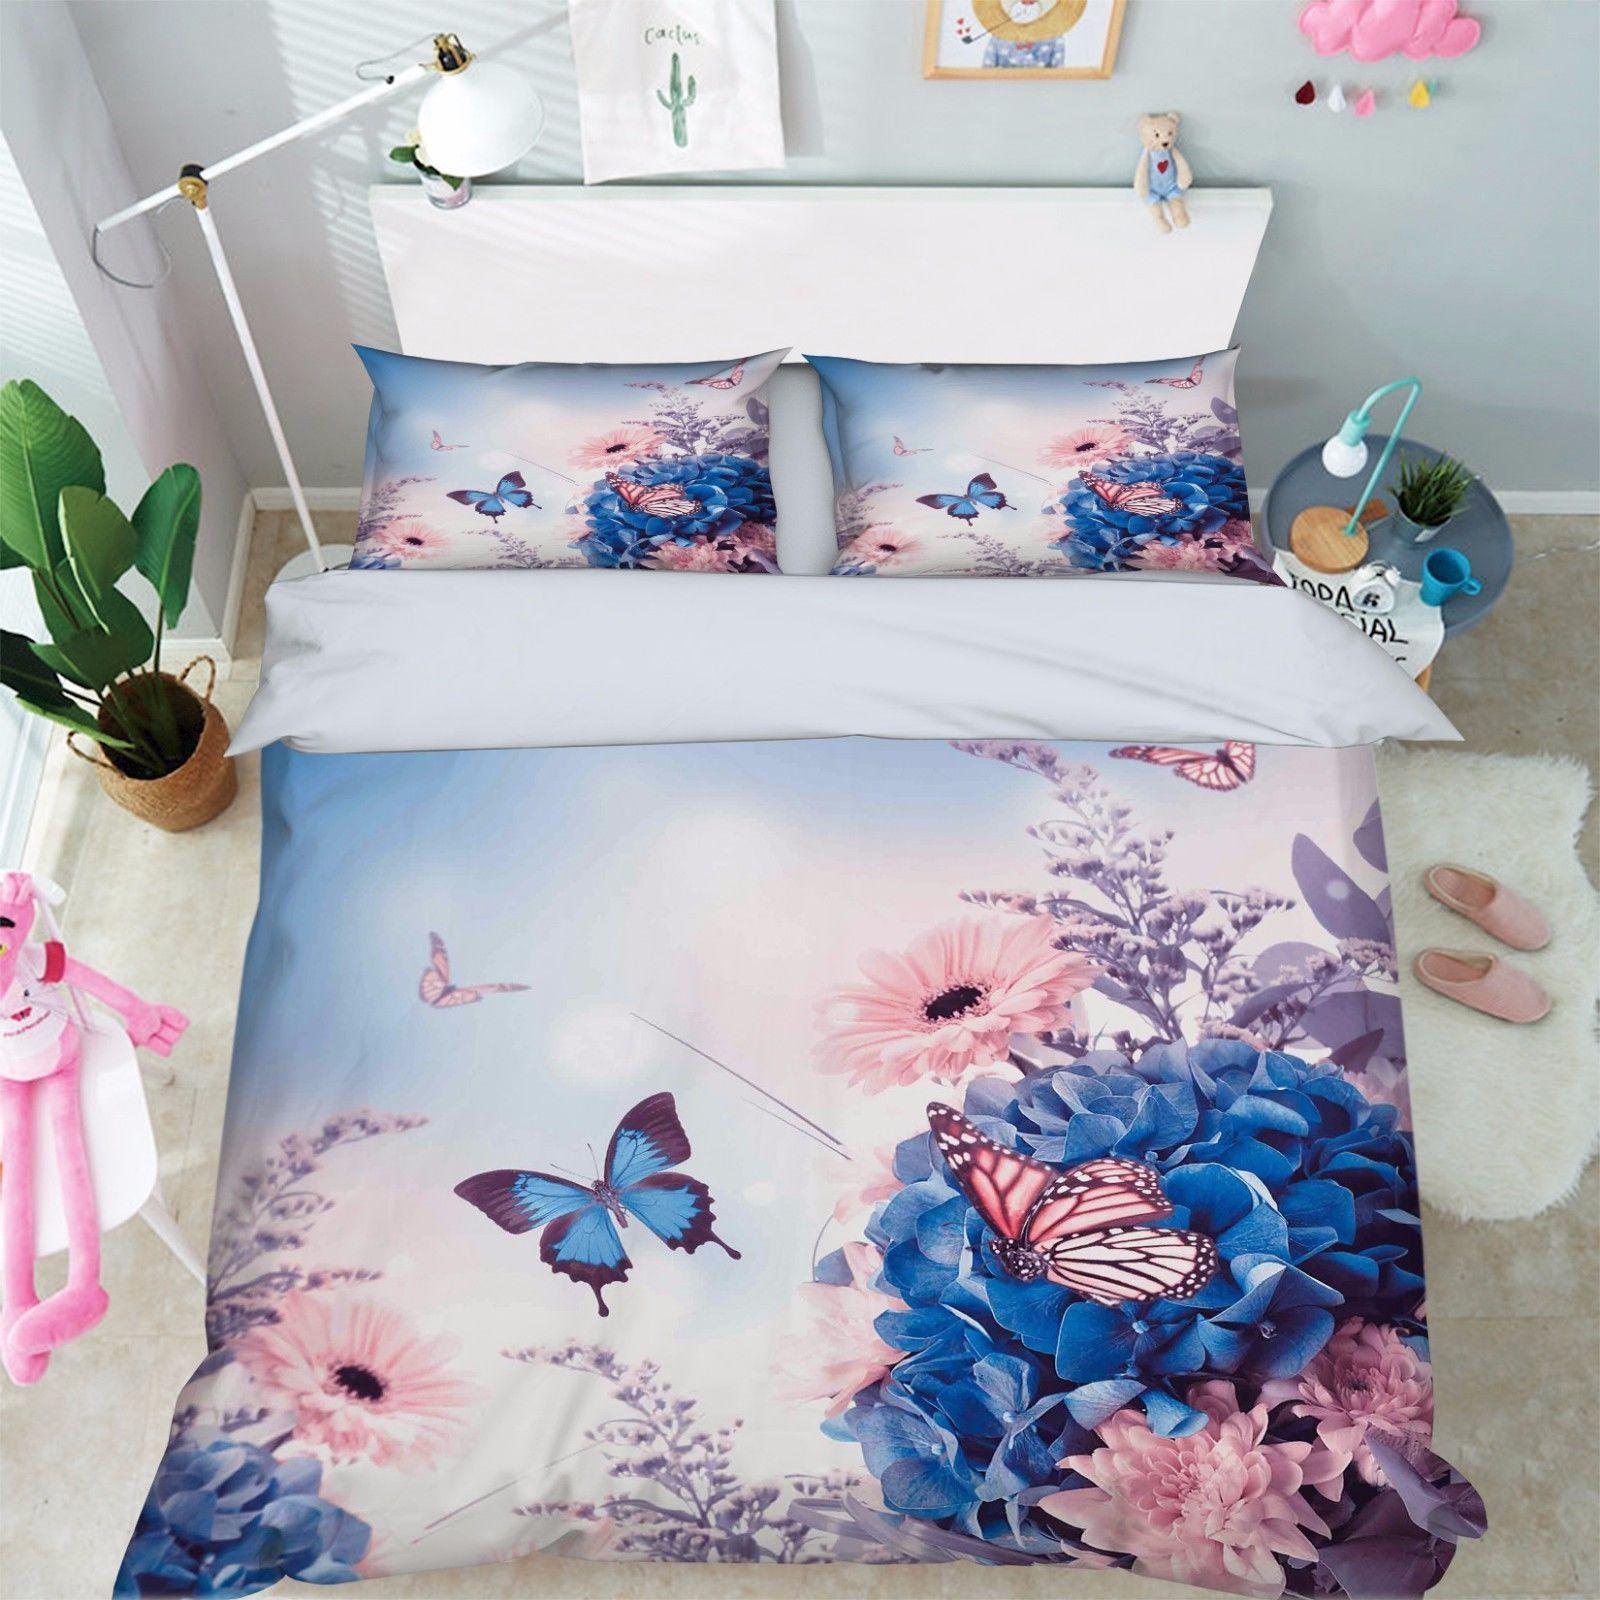 3D Mountain Bear Bed Pillowcases Quilt Duvet Cover Set Single Queen King Size AU